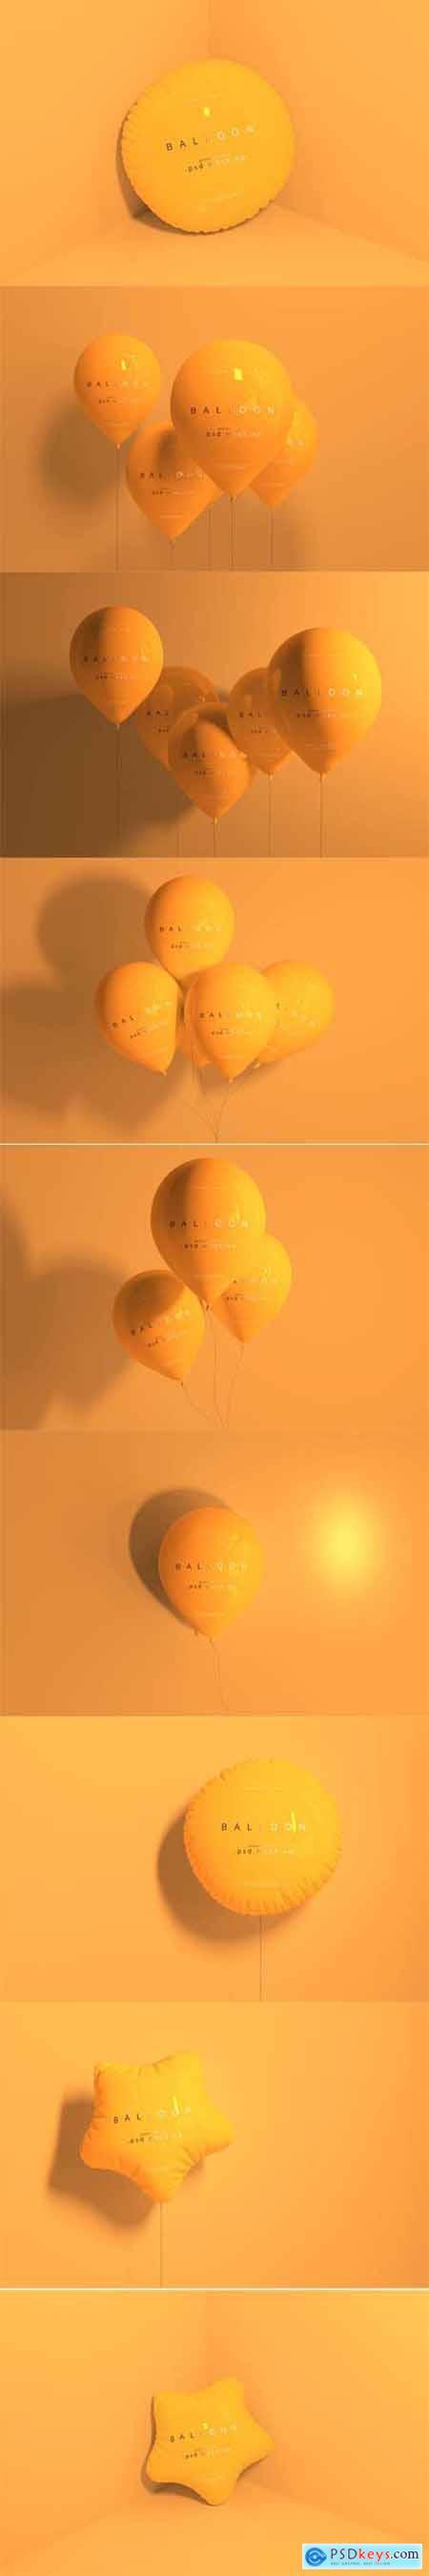 Orange balloon mockup